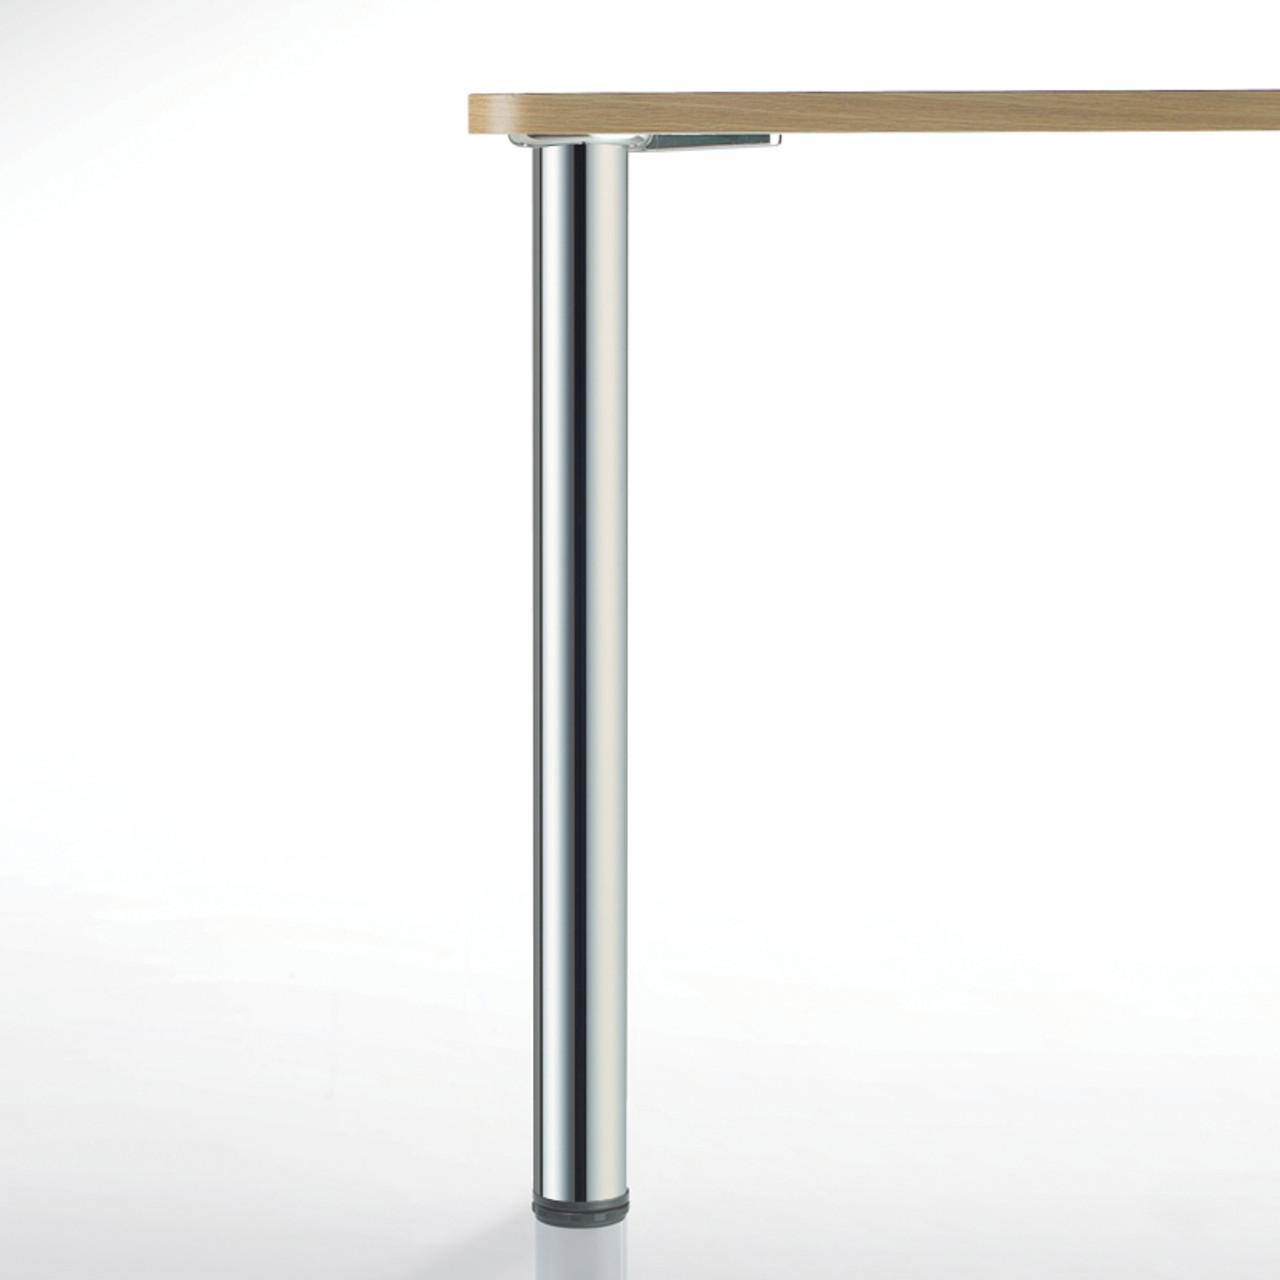 Hamburg Table Leg, Chrome, 34-1/4'', 2-3/8'' diameter leg 1-1/8'' adjustable foot - replacementtablelegs.com